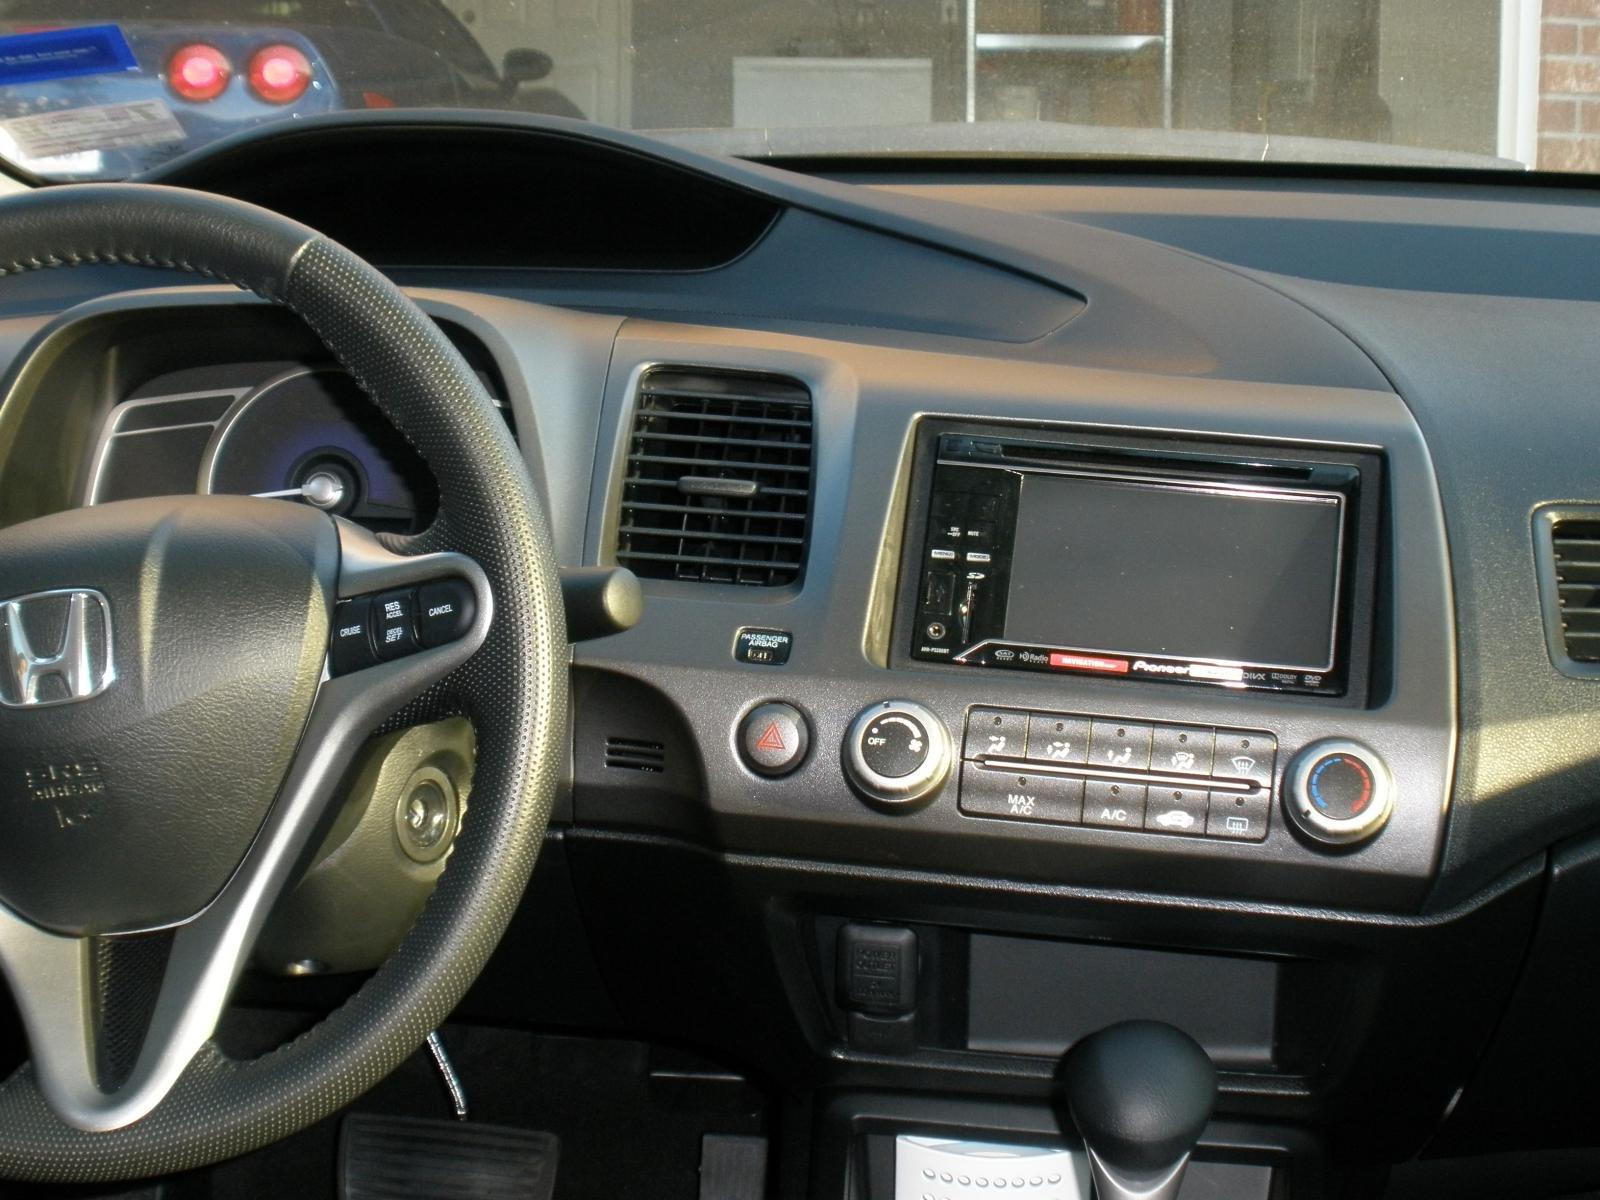 Pioneer AVH-P3300BT Install - Page 2 - 8th Generation Honda Civic Forum